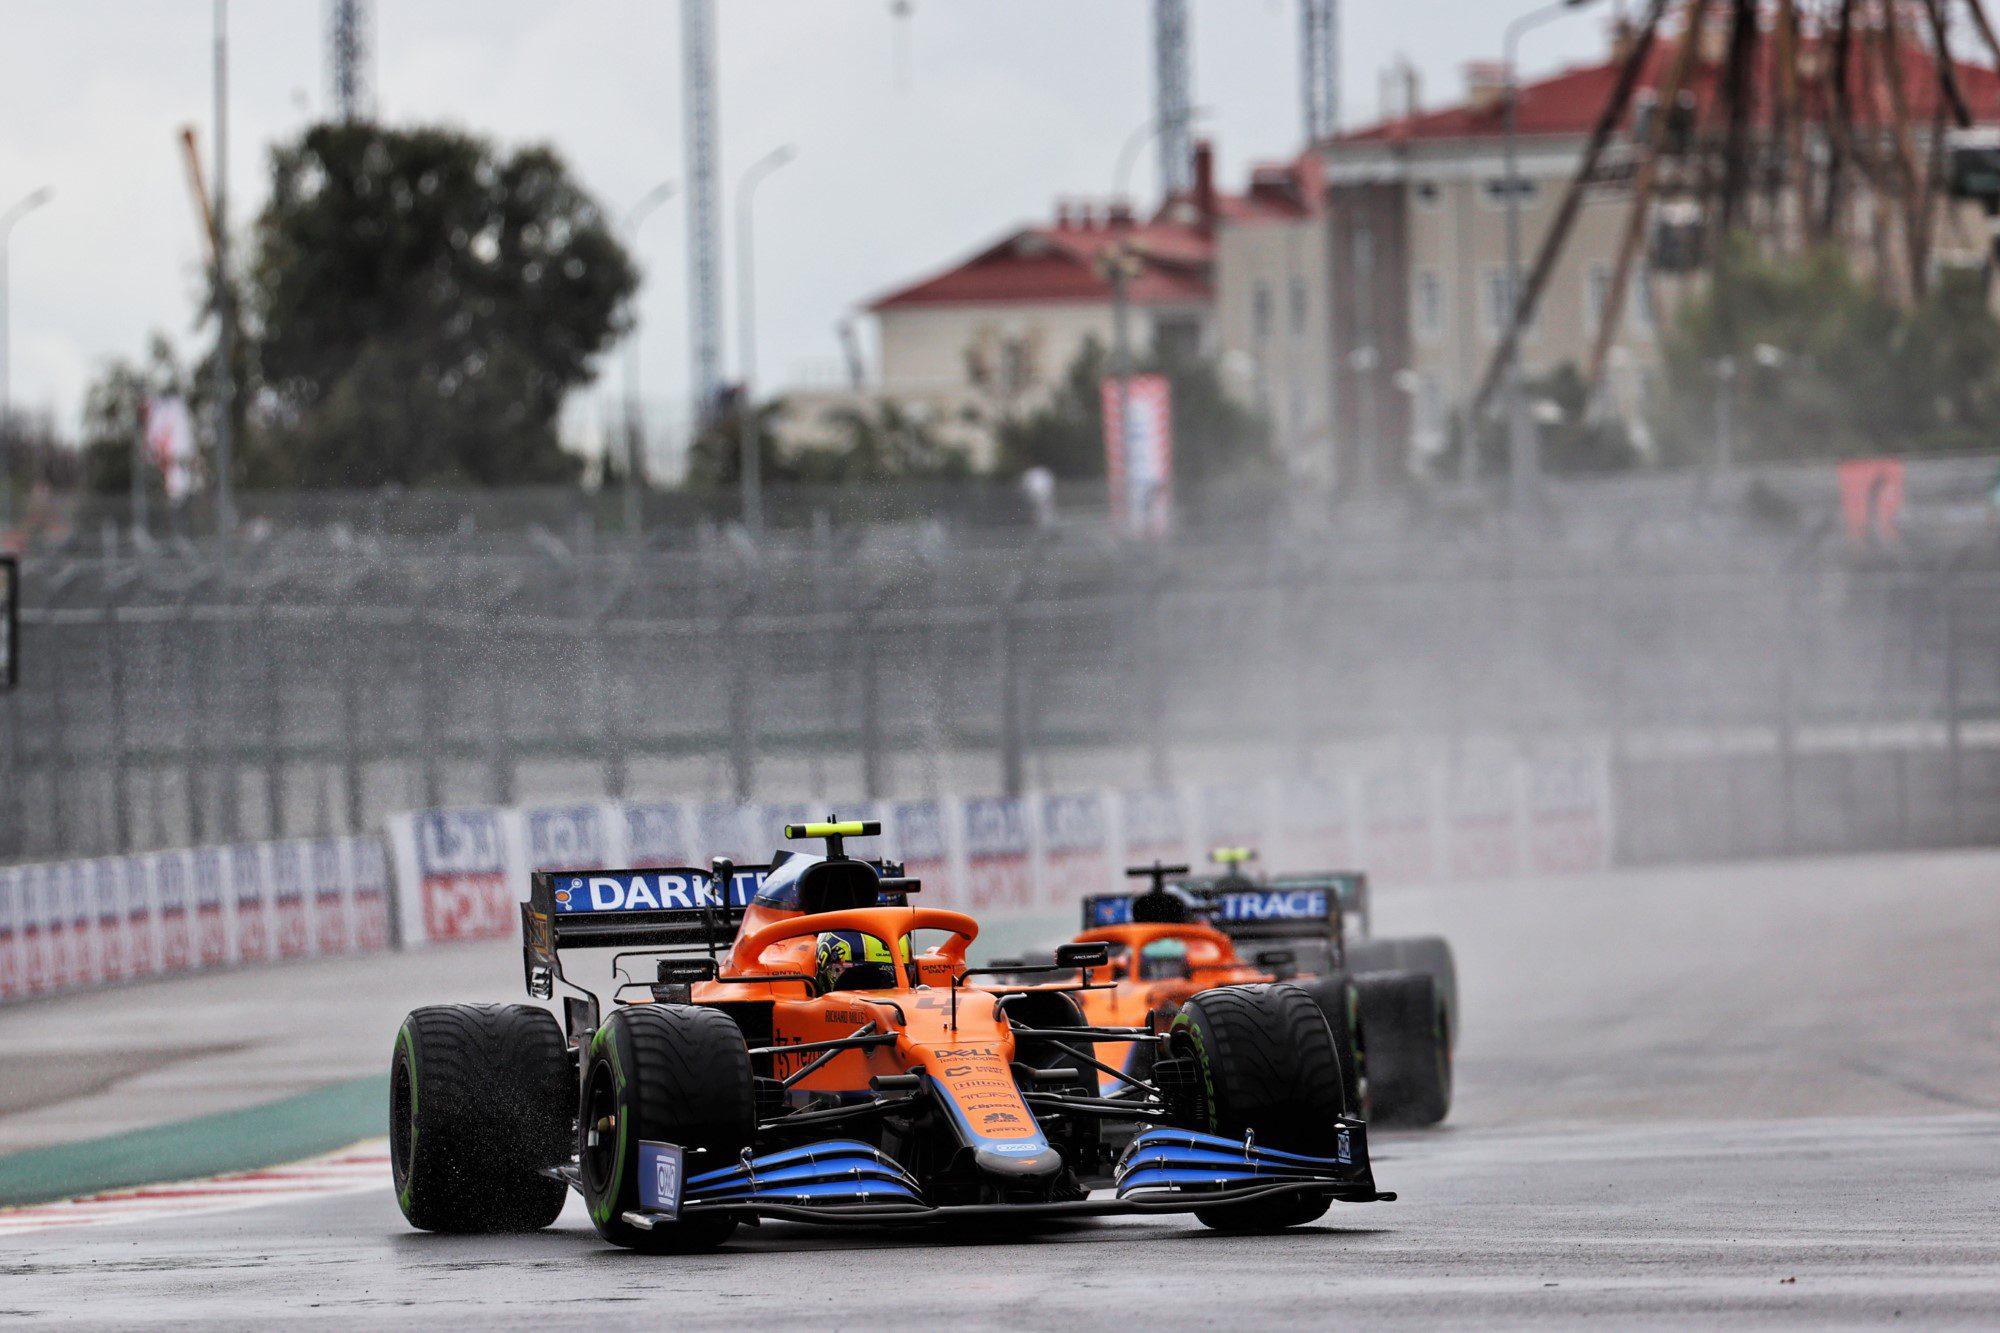 Na Rússia, Norris surpreende e garante sua primeira pole na F1